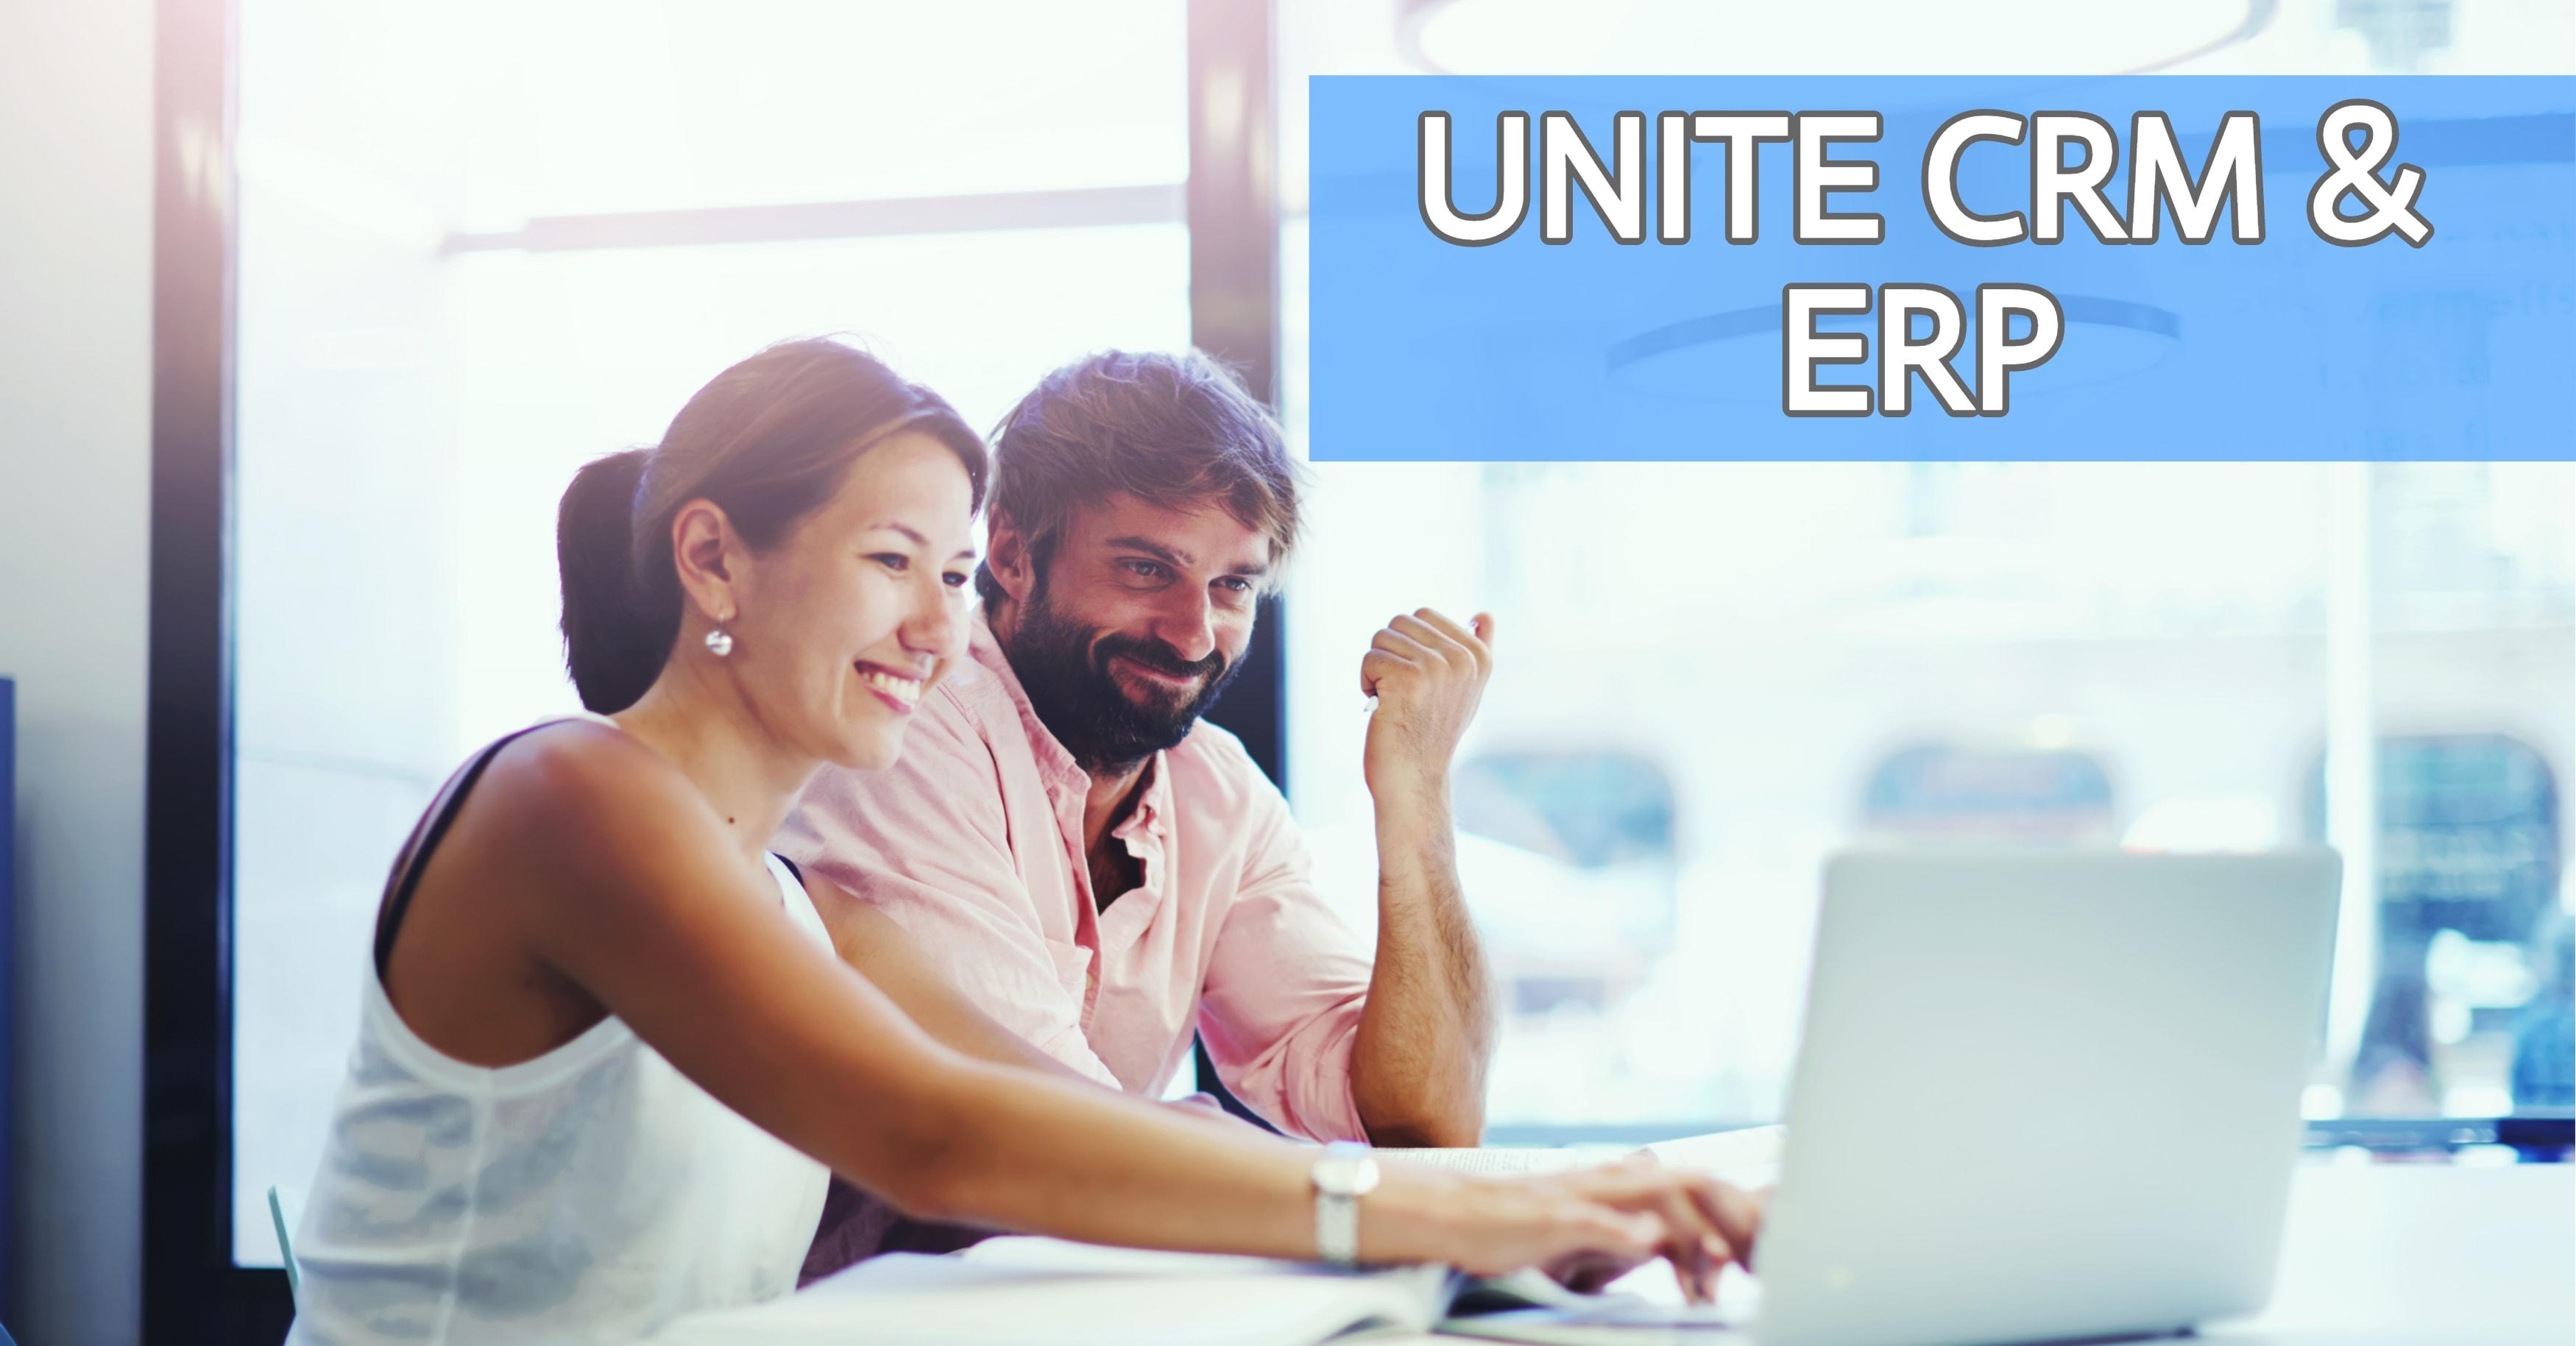 Unity CRM ERP